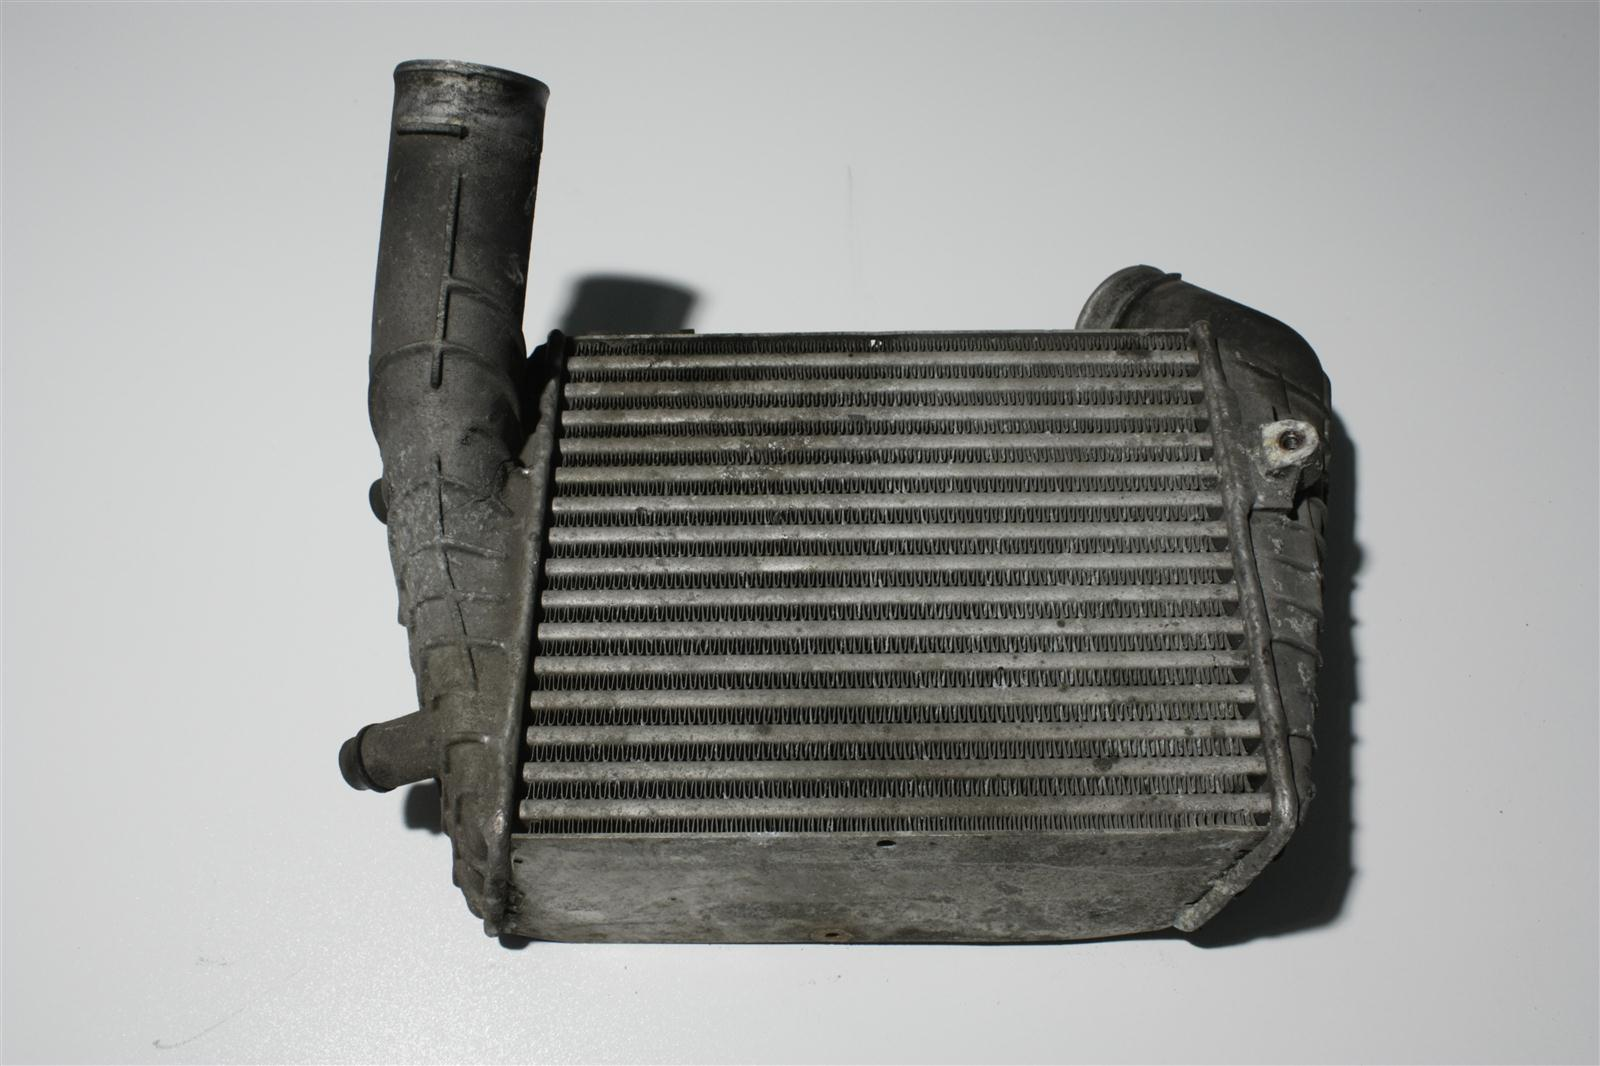 Audi S4/S6 C4 AAN Ladeluftkühler Voll-Alu-Ausführung 4A0145805J 4A0145805D